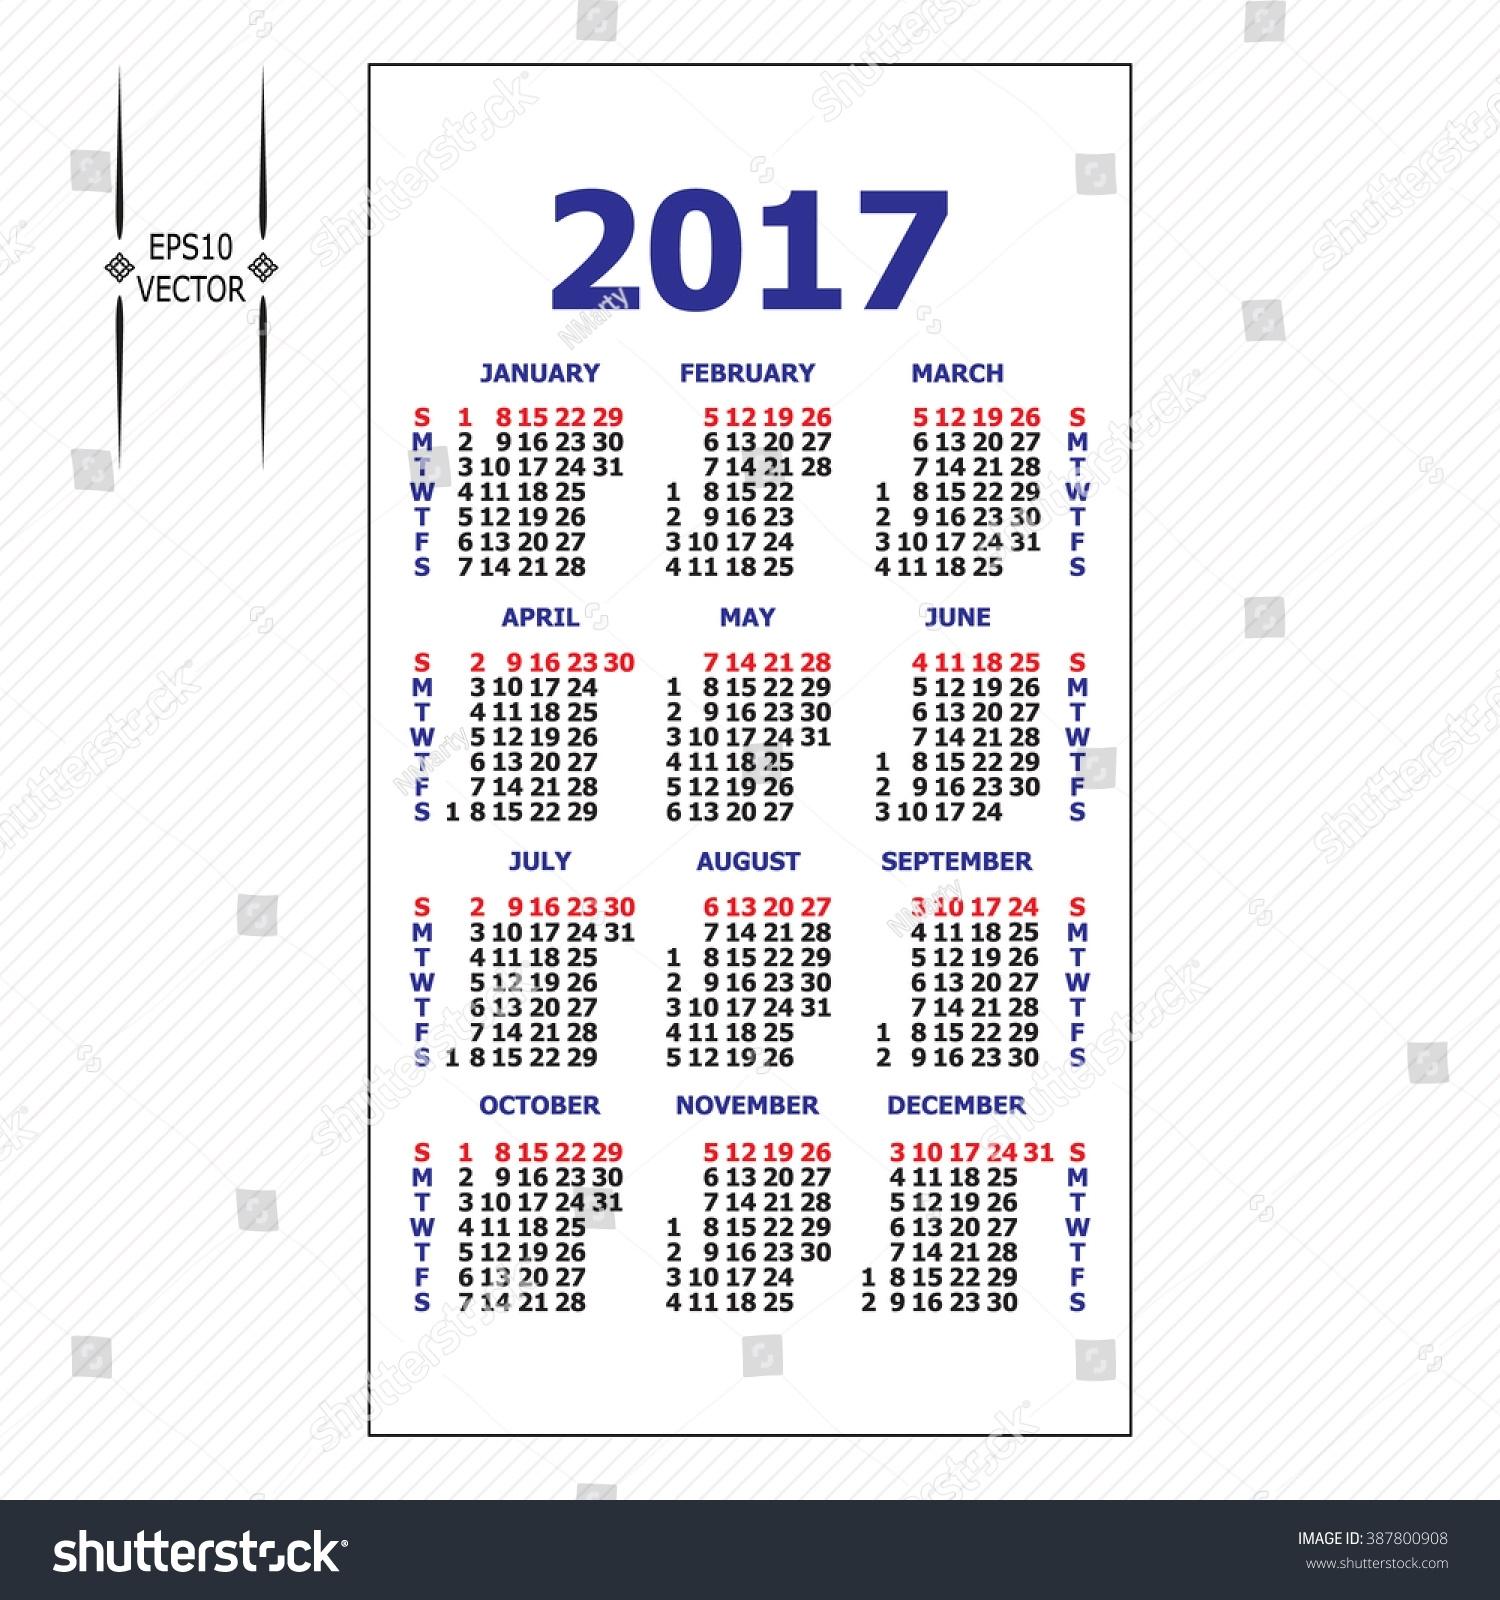 2017 Pocket Calendar Template Calendar Grid Stock Vector (Royalty for Grid Of 31 Days Image